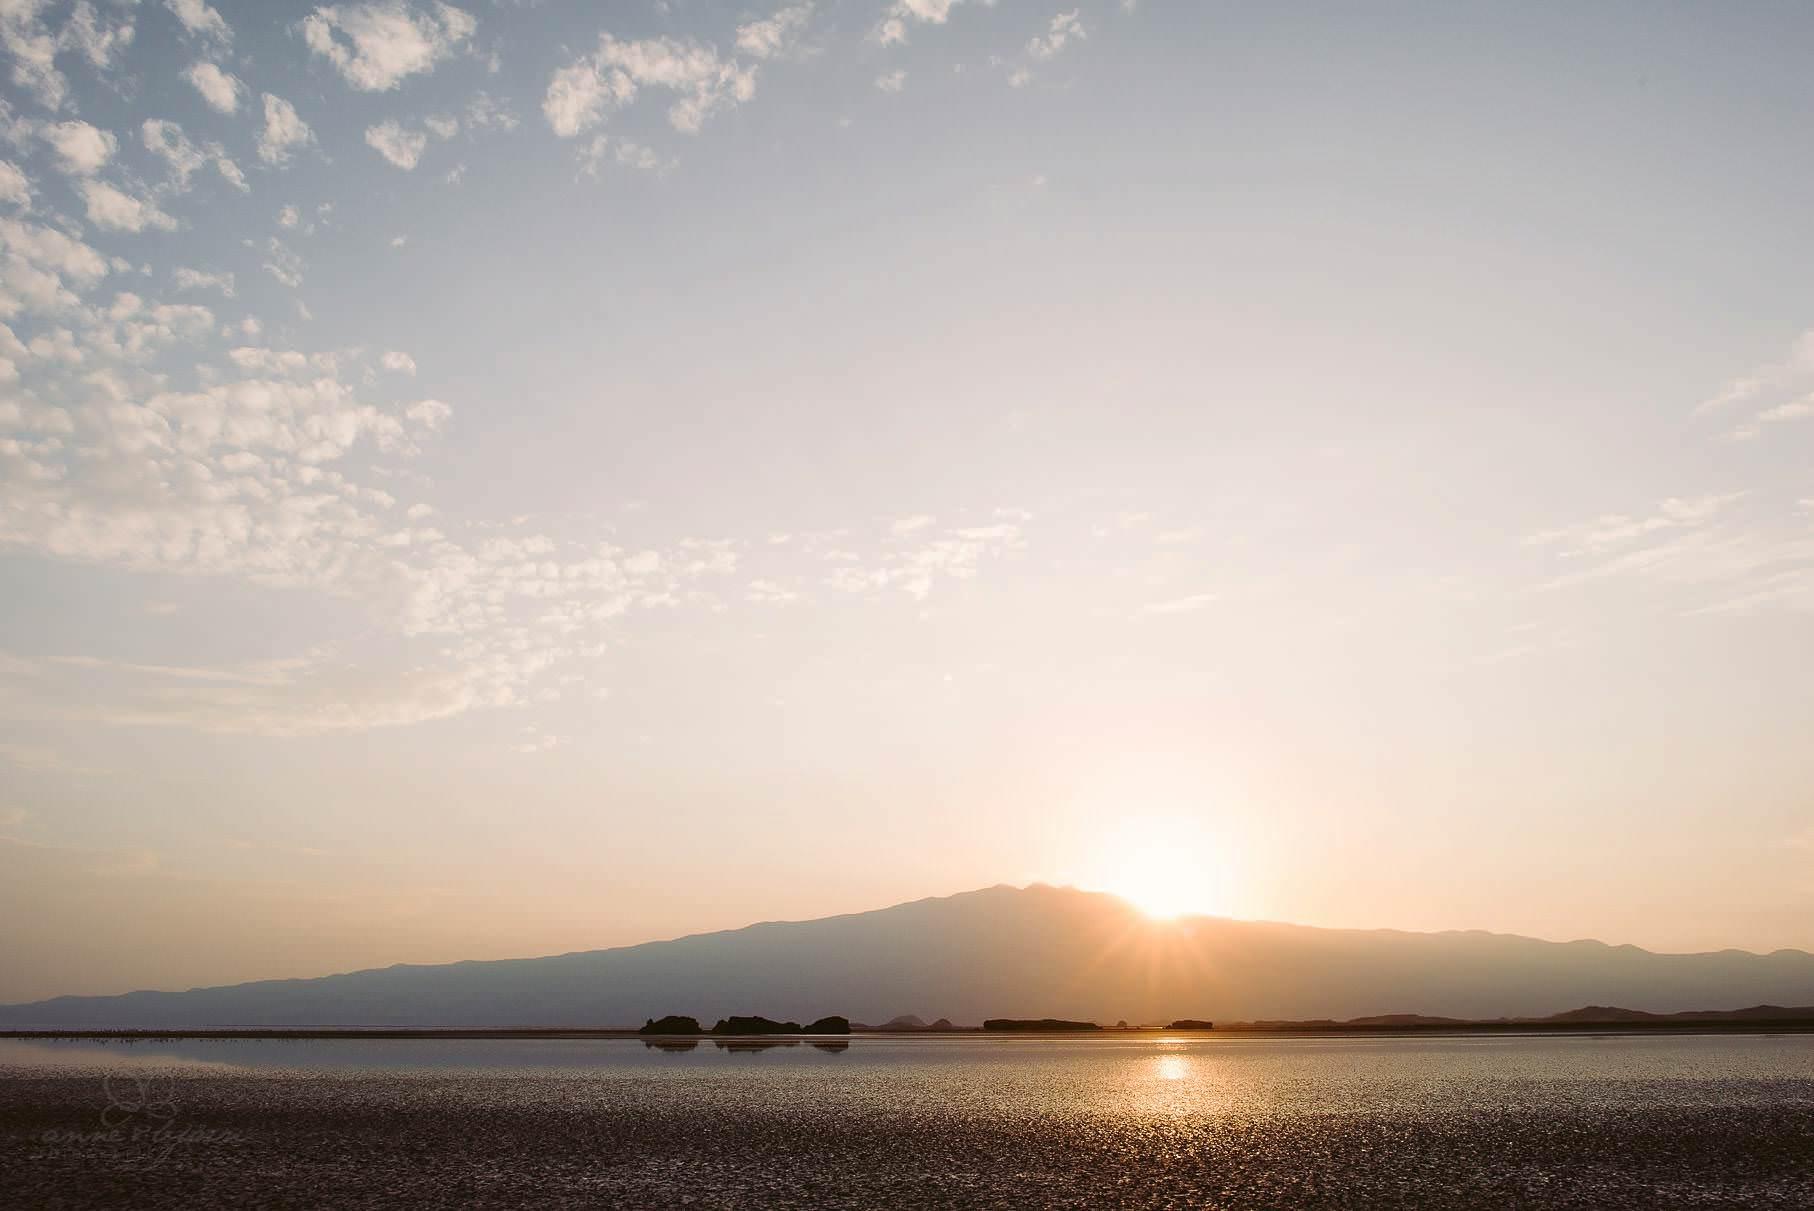 0023 tansania nd8 9815 anne bjoern fotografie hochzeitsfotograf hamburg - This is Tanzania - Serengeti, Kilimanjaro & Sansibar